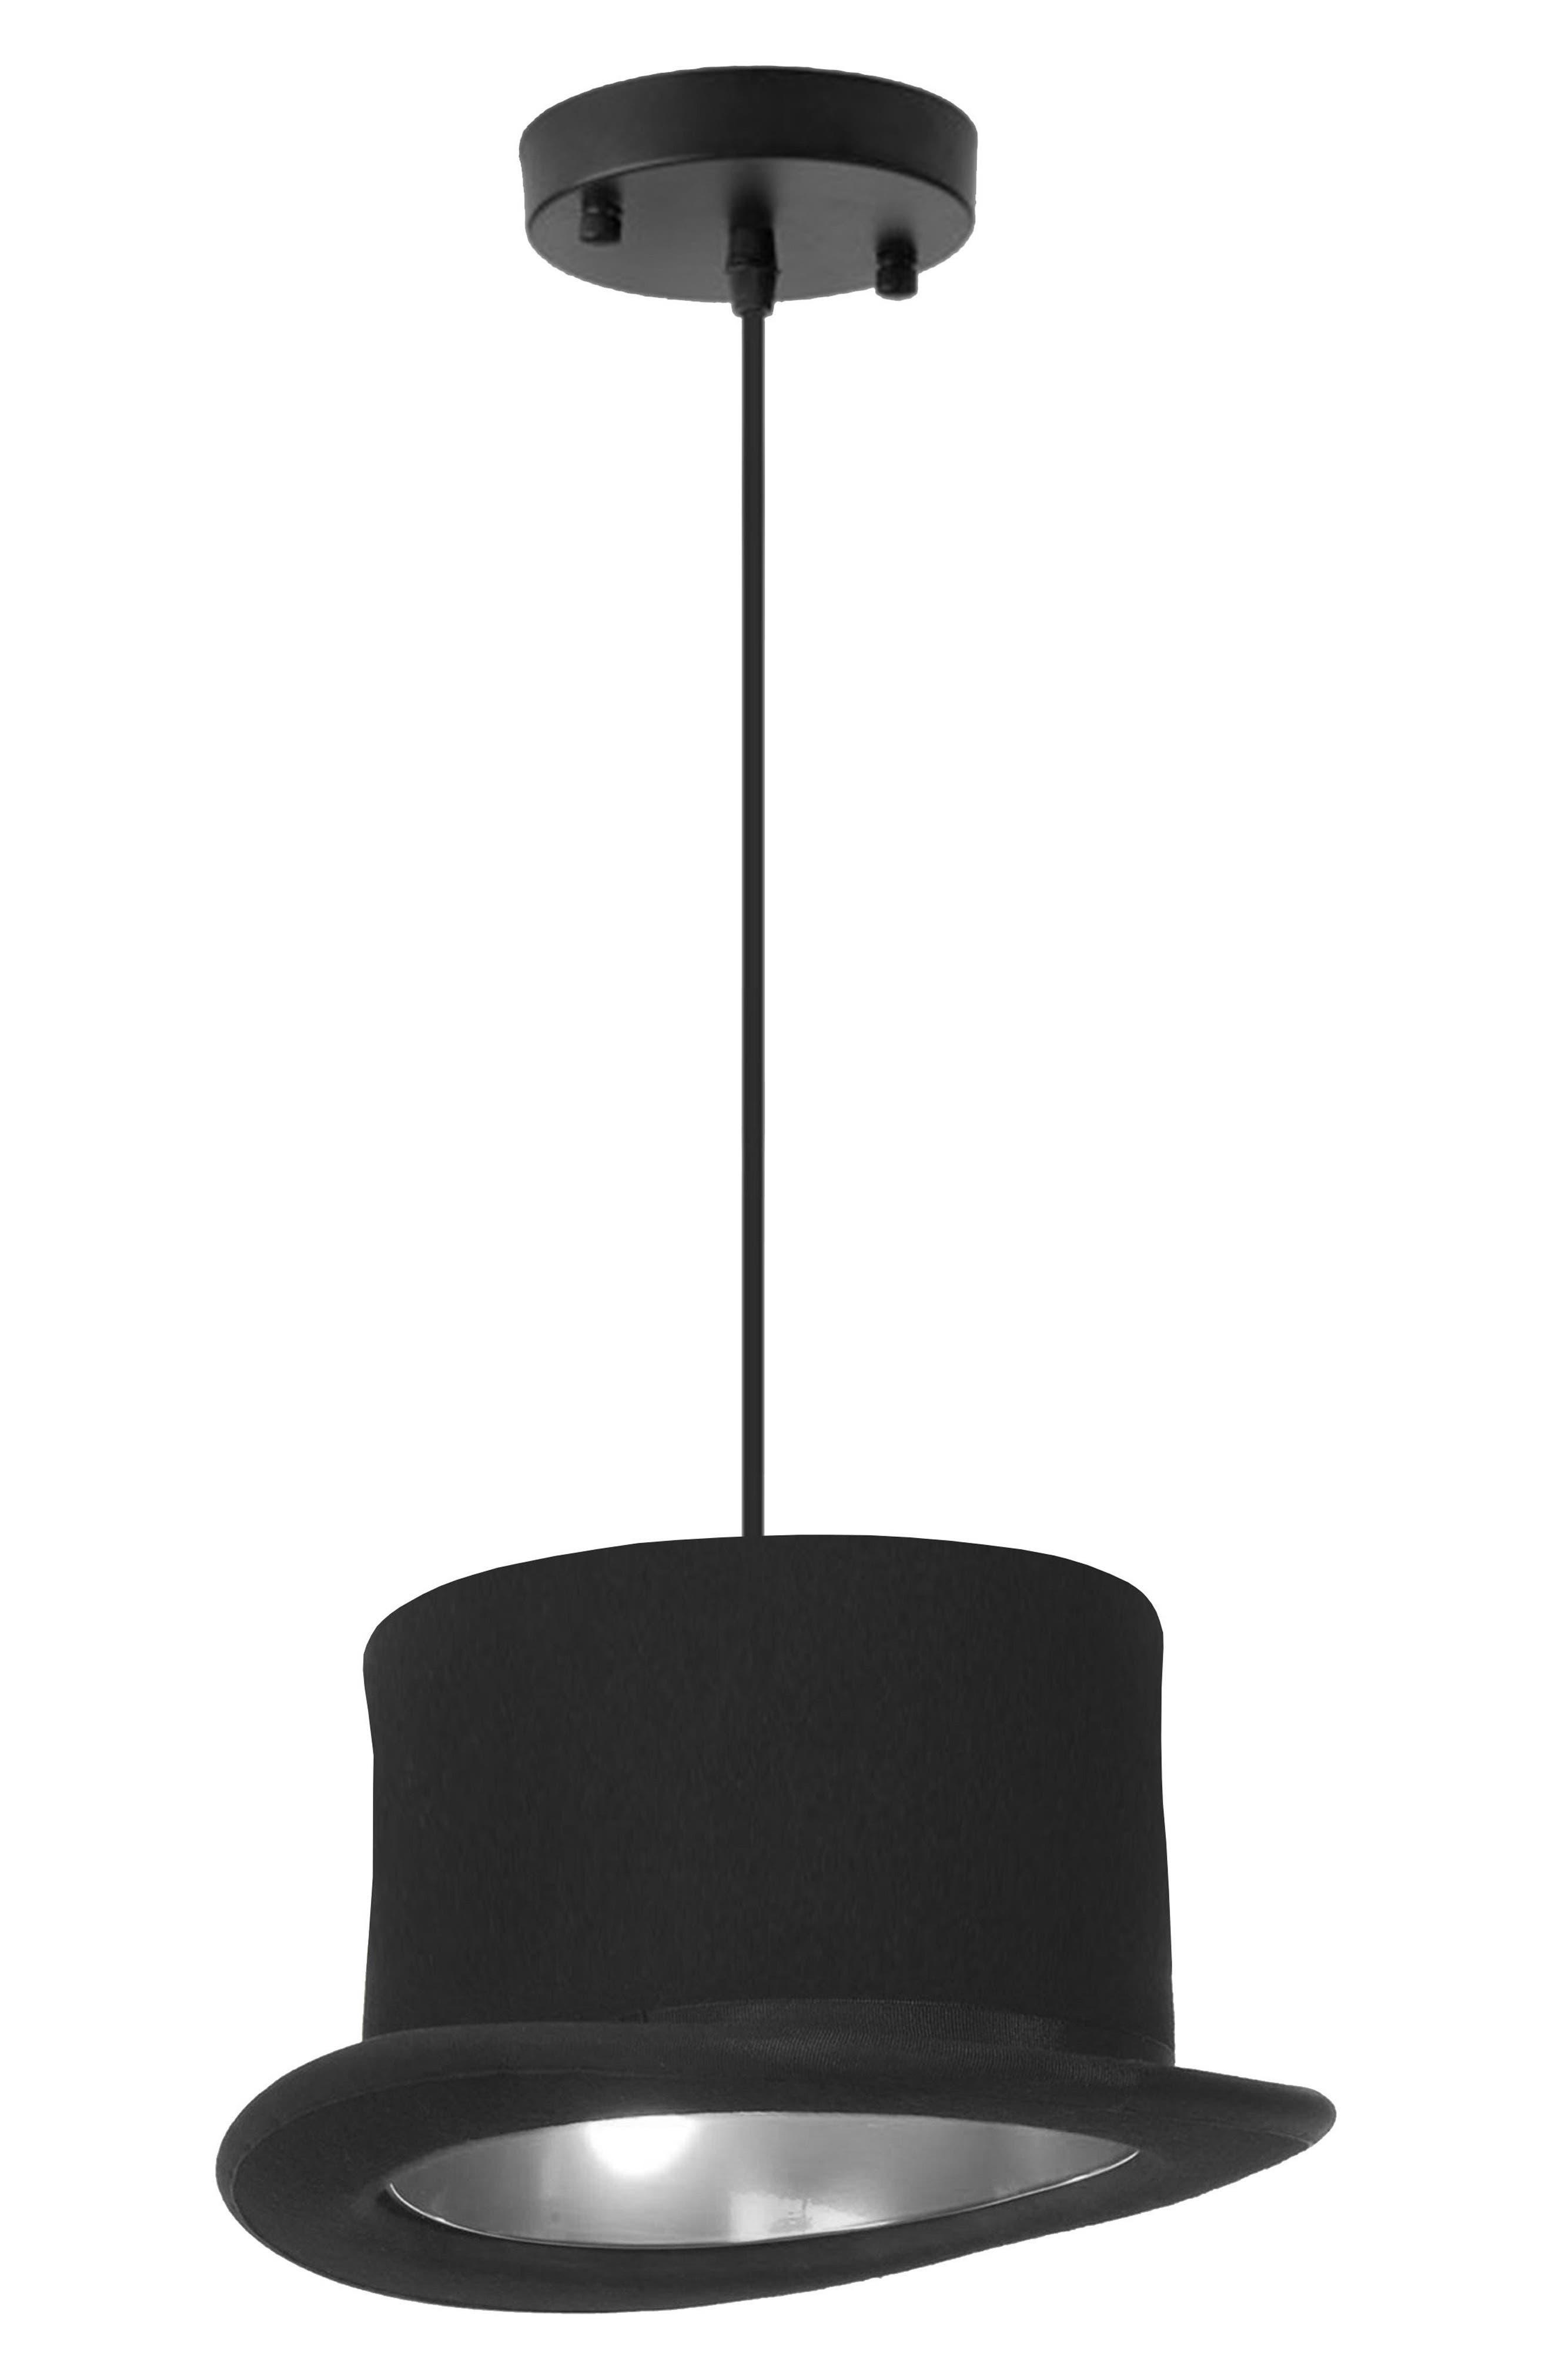 Langley Top Hat Ceiling Fixture,                             Main thumbnail 1, color,                             Black